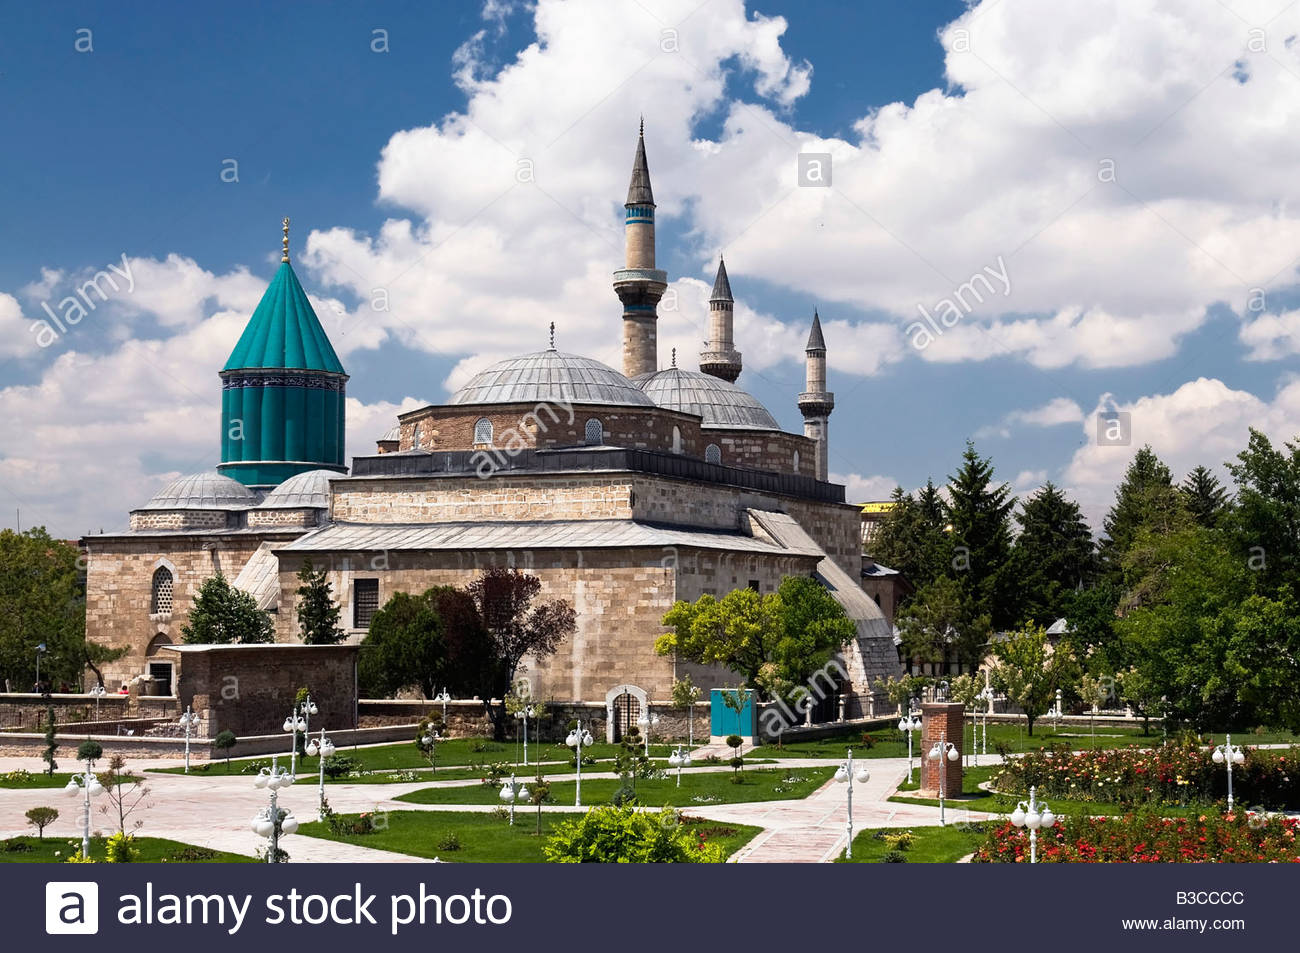 Tomb of Mevlana C. Rumi and Museum at Konya - Stock Image